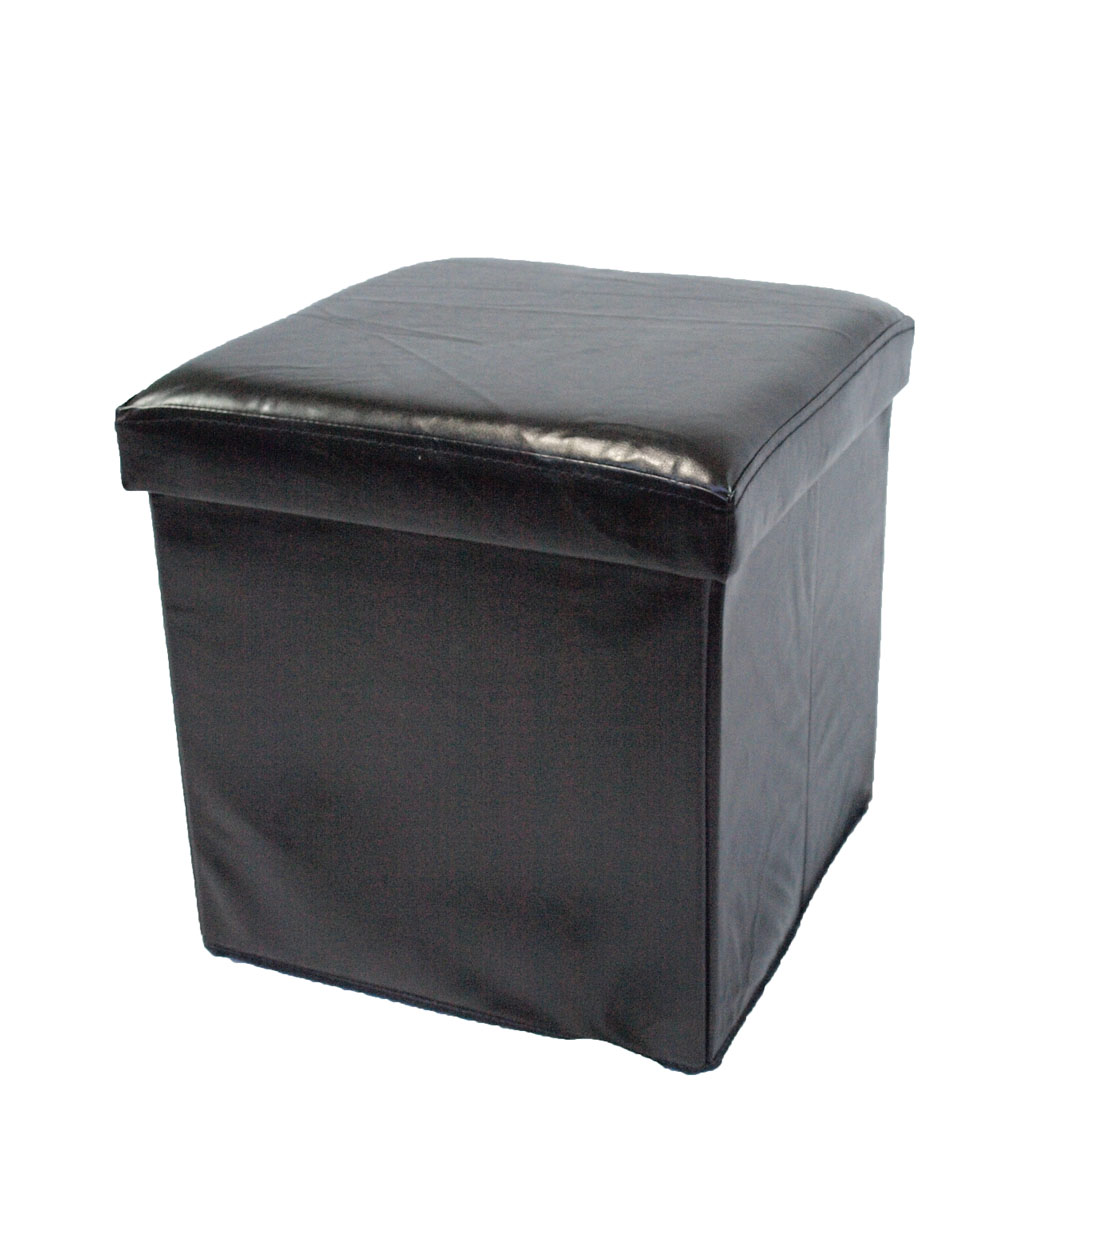 Multi Purpose Faux Leather Folding Ottoman Storage Box